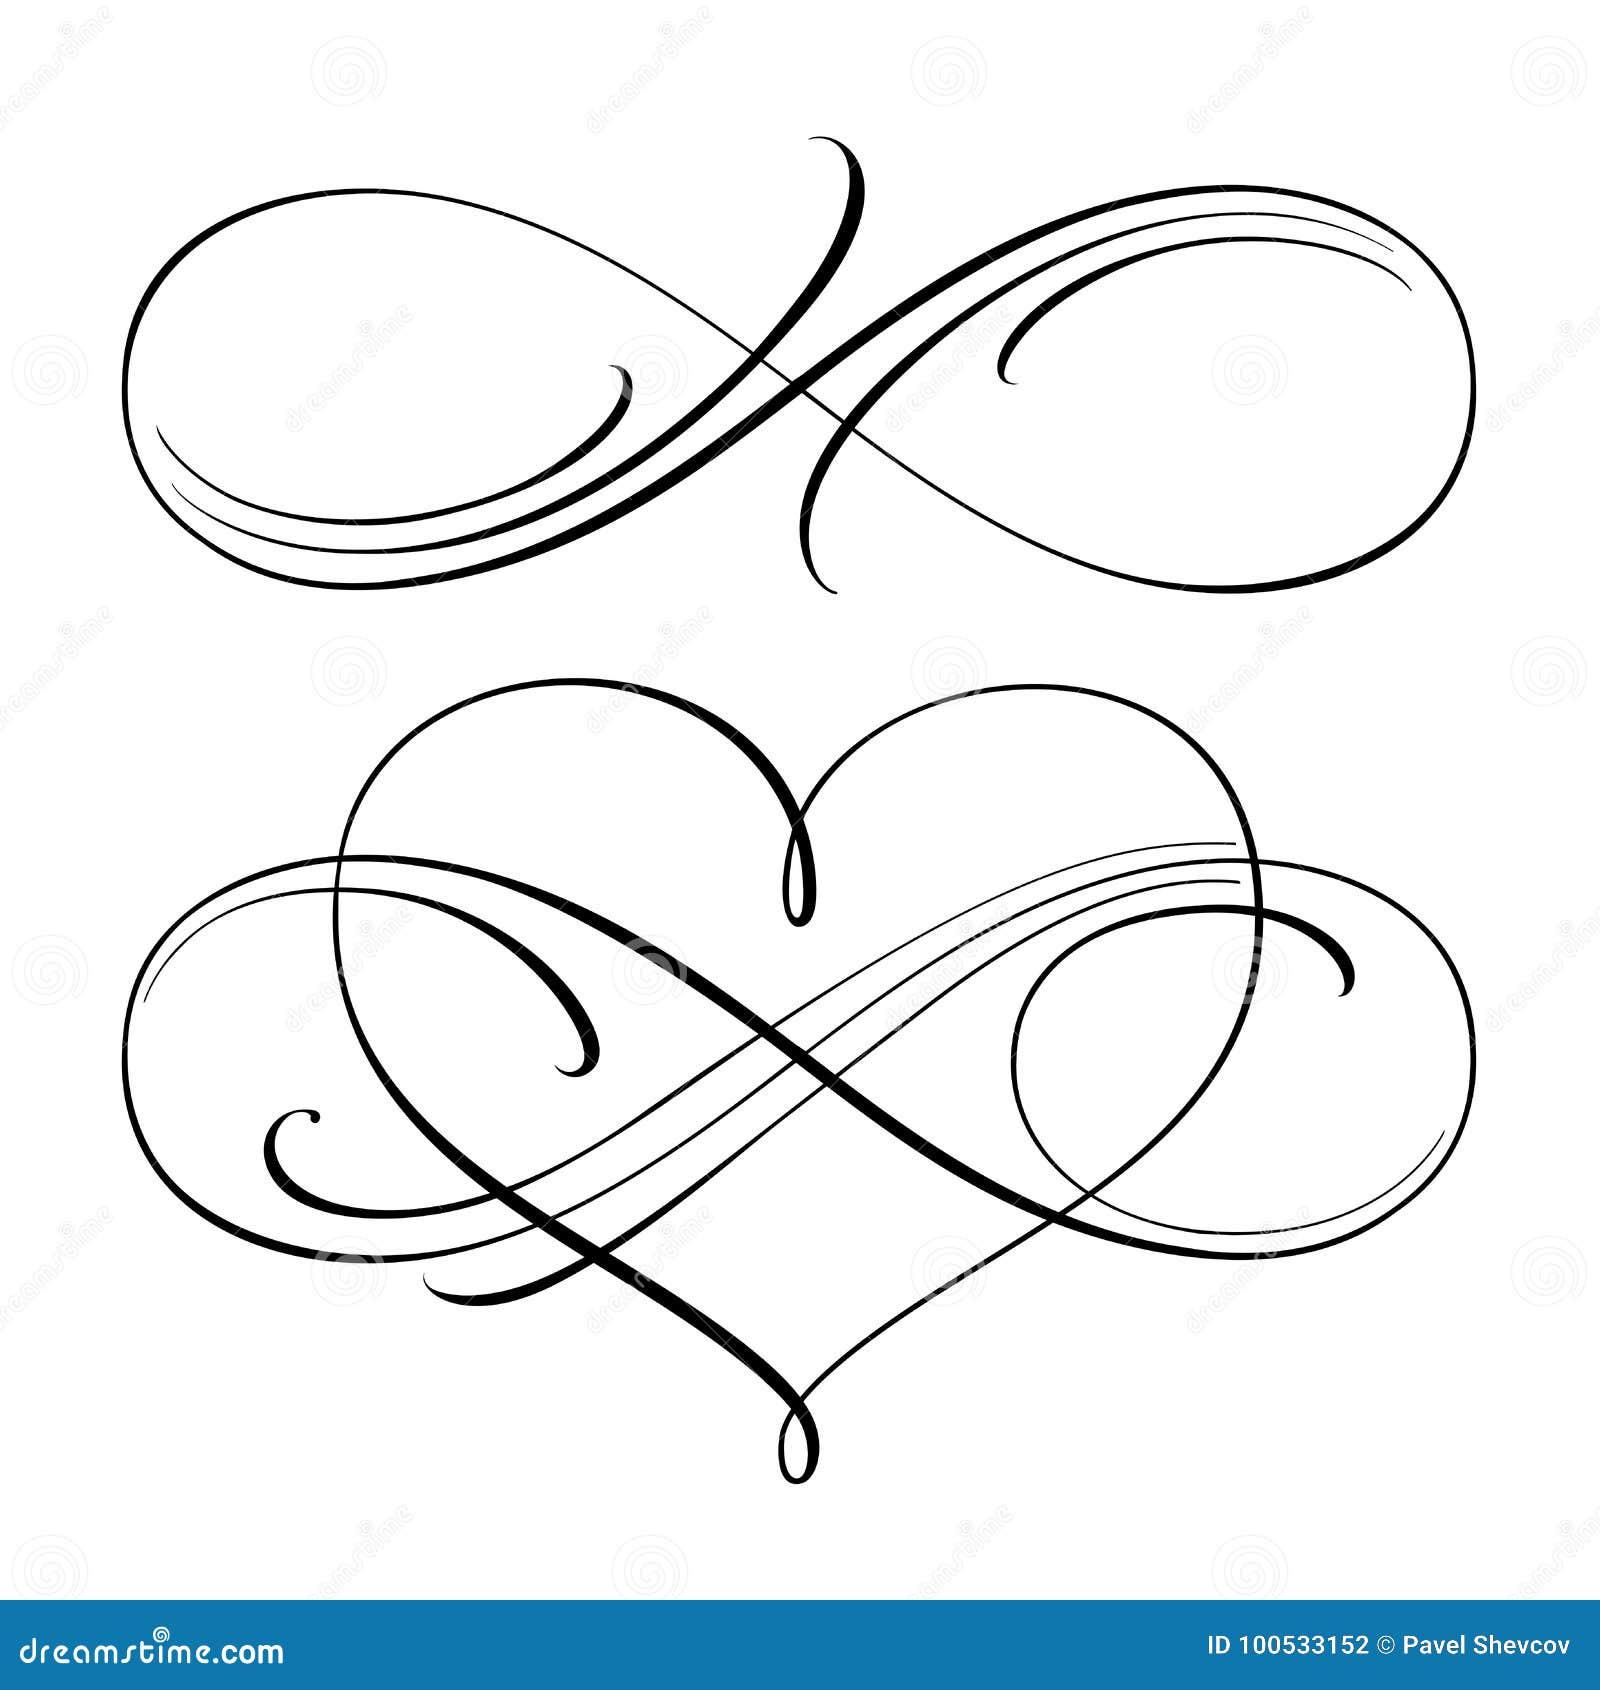 Infinite Love Symbols Stock Vector Illustration Of Part 100533152